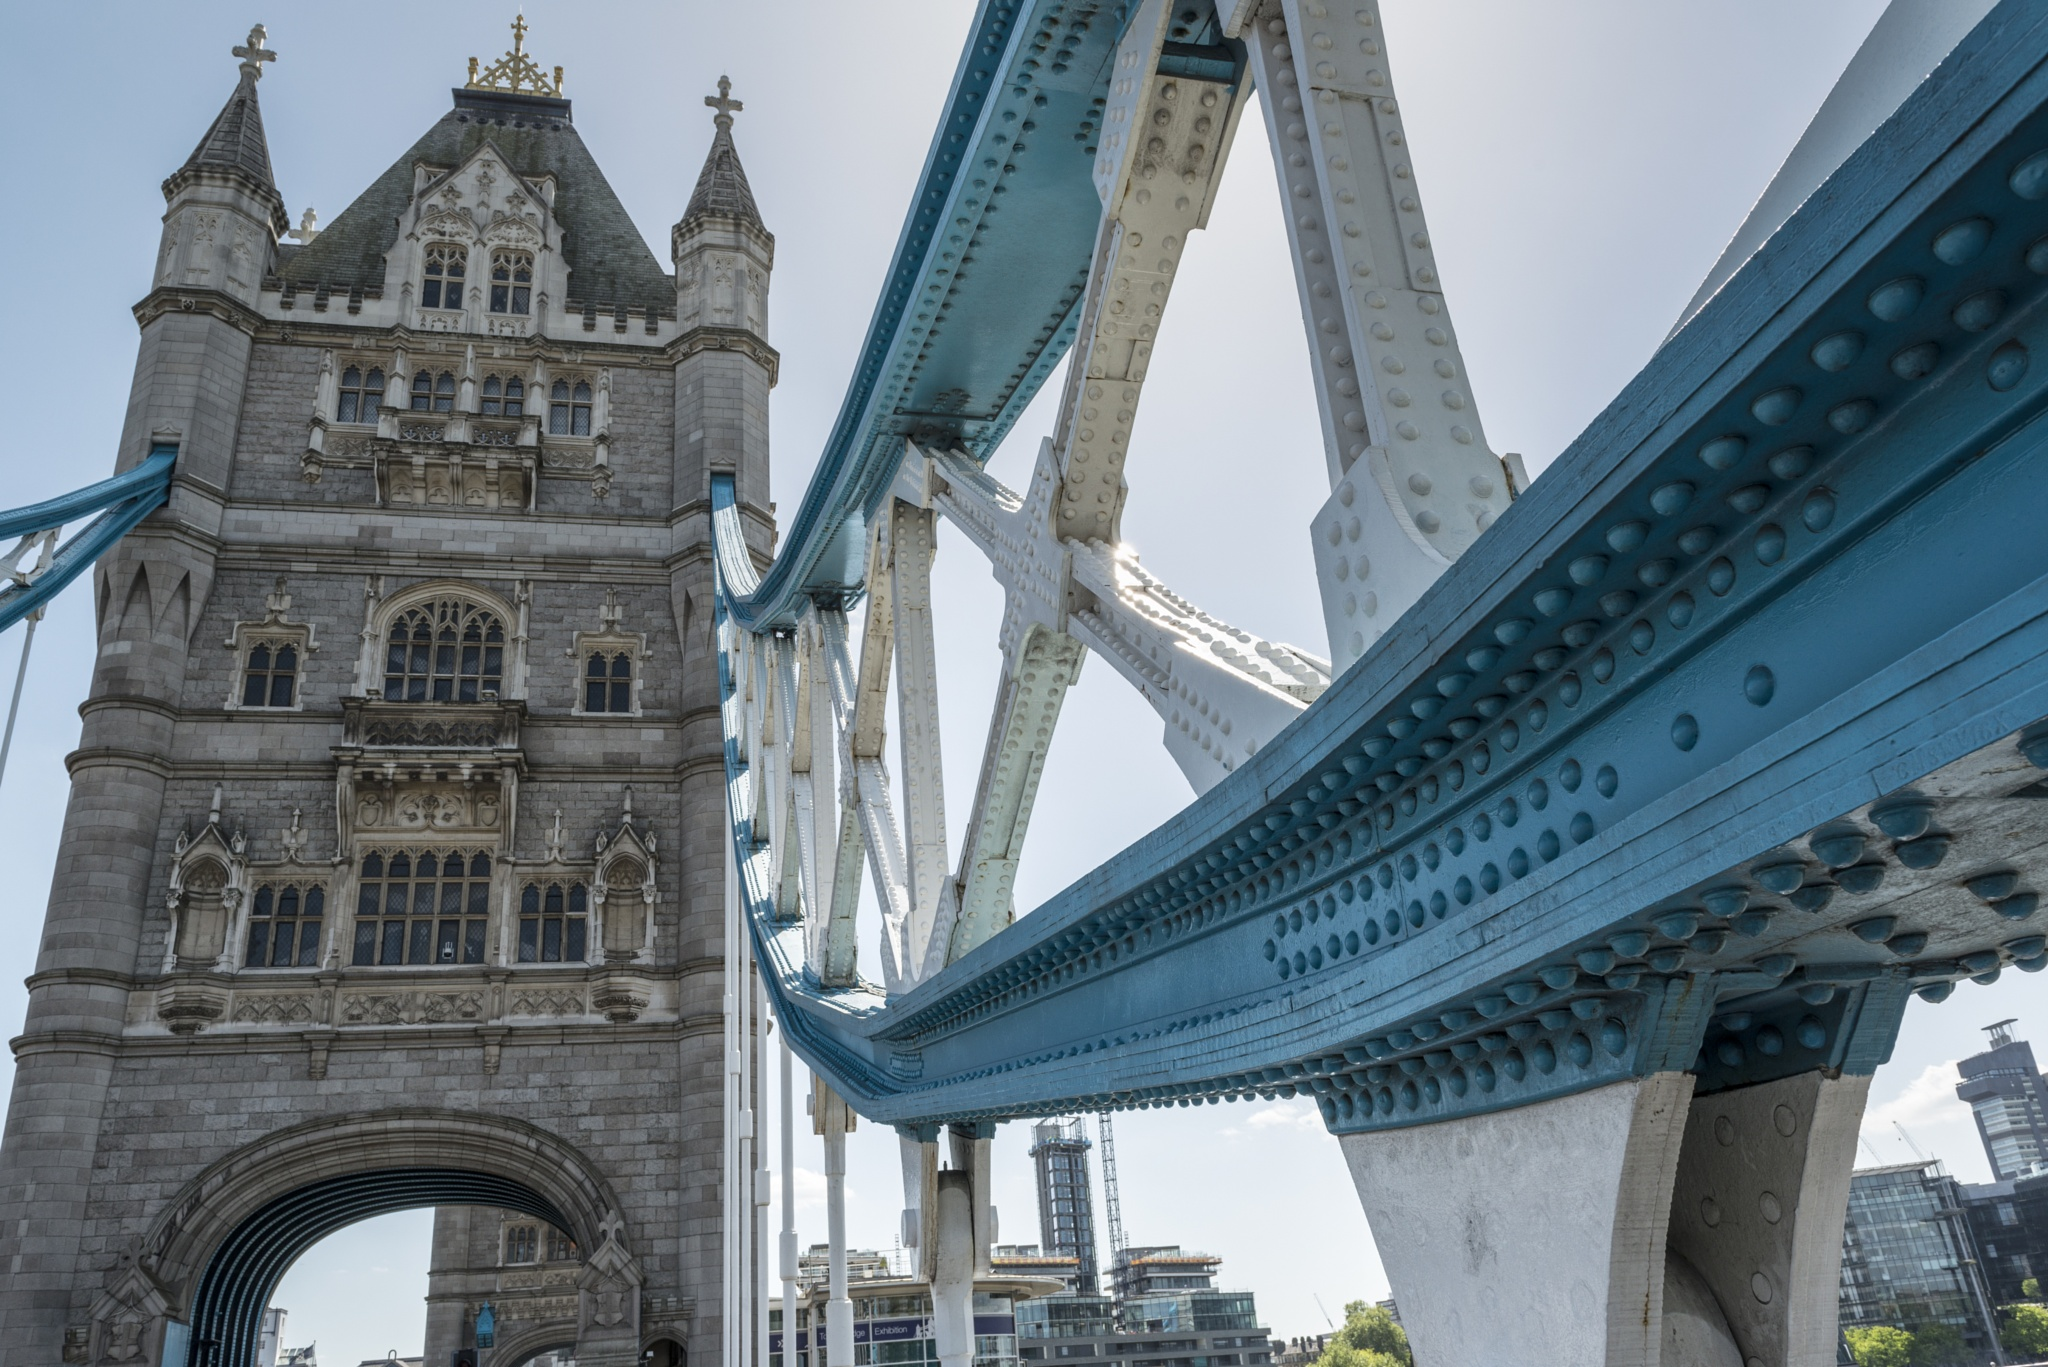 Tower Bridge by Fotoguy